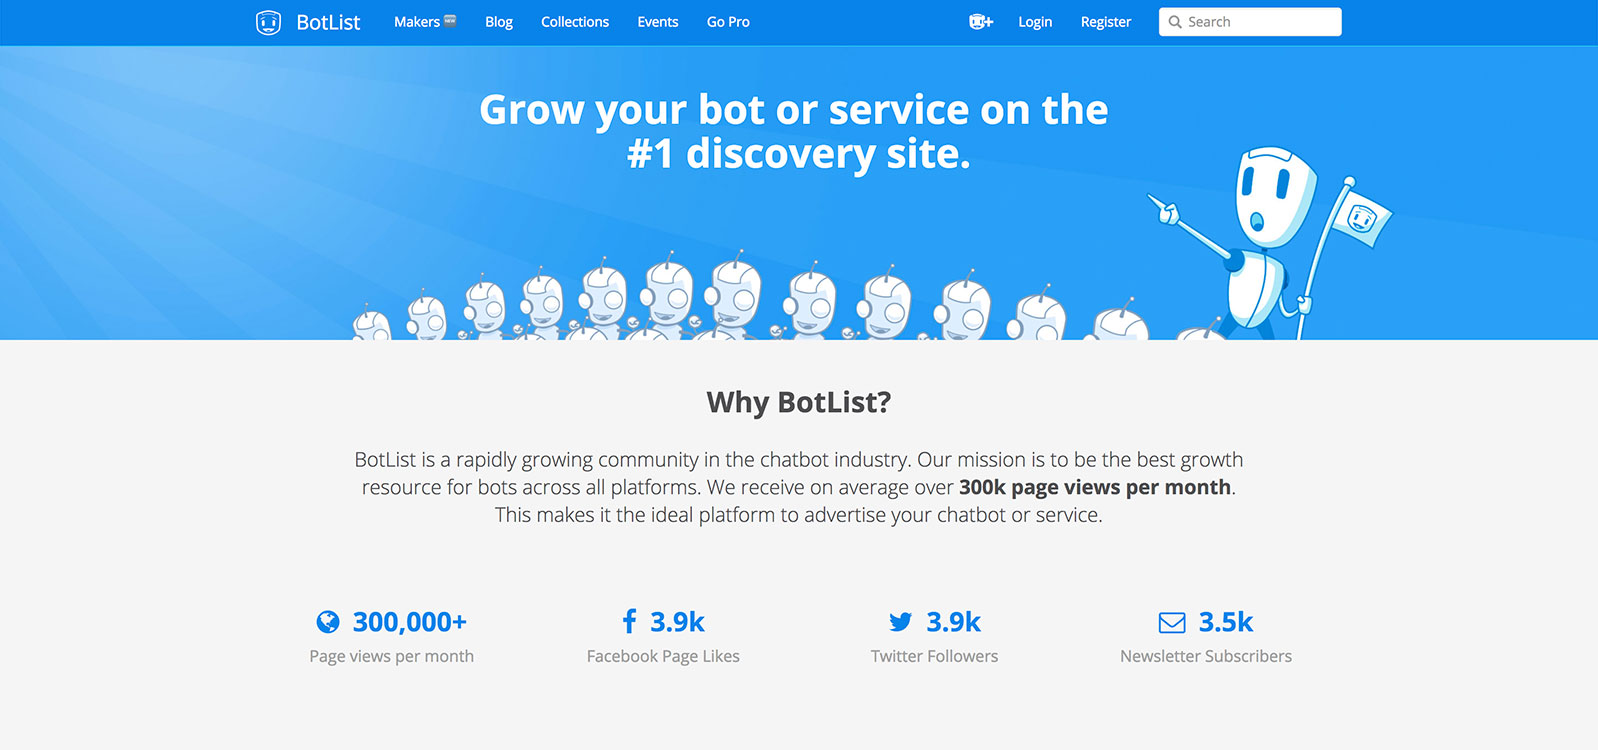 BotList Advertisers Page